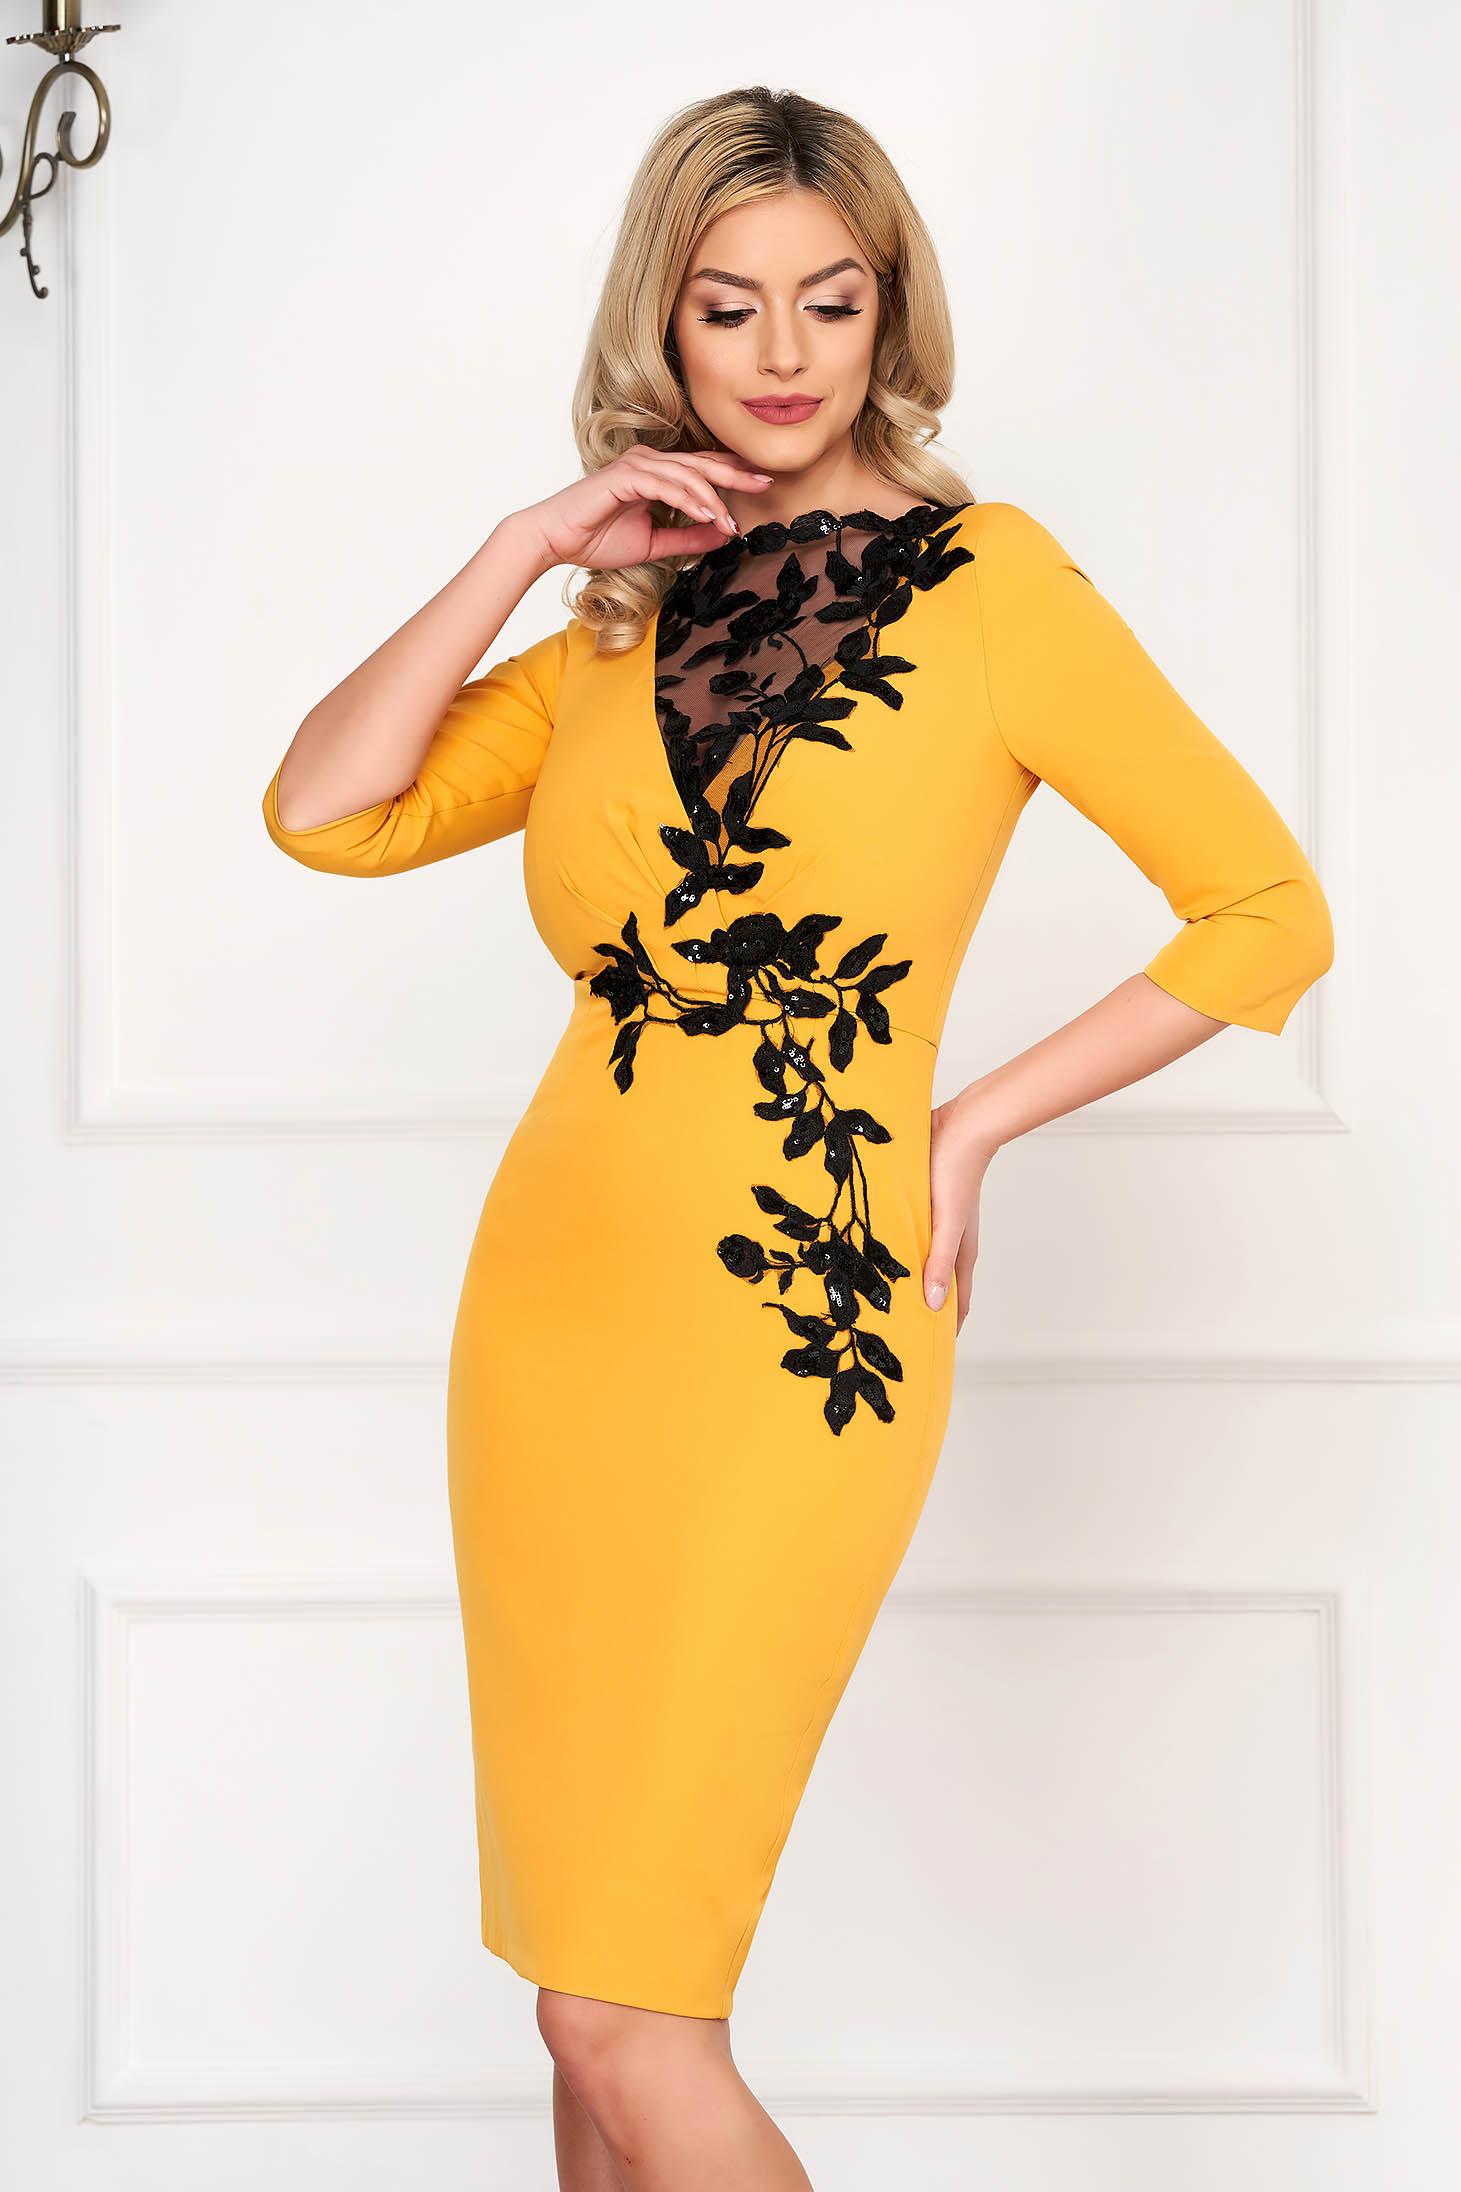 Rochie mustarie midi de ocazie din stofa elastica cu maneci trei-sferturi si broderie florala